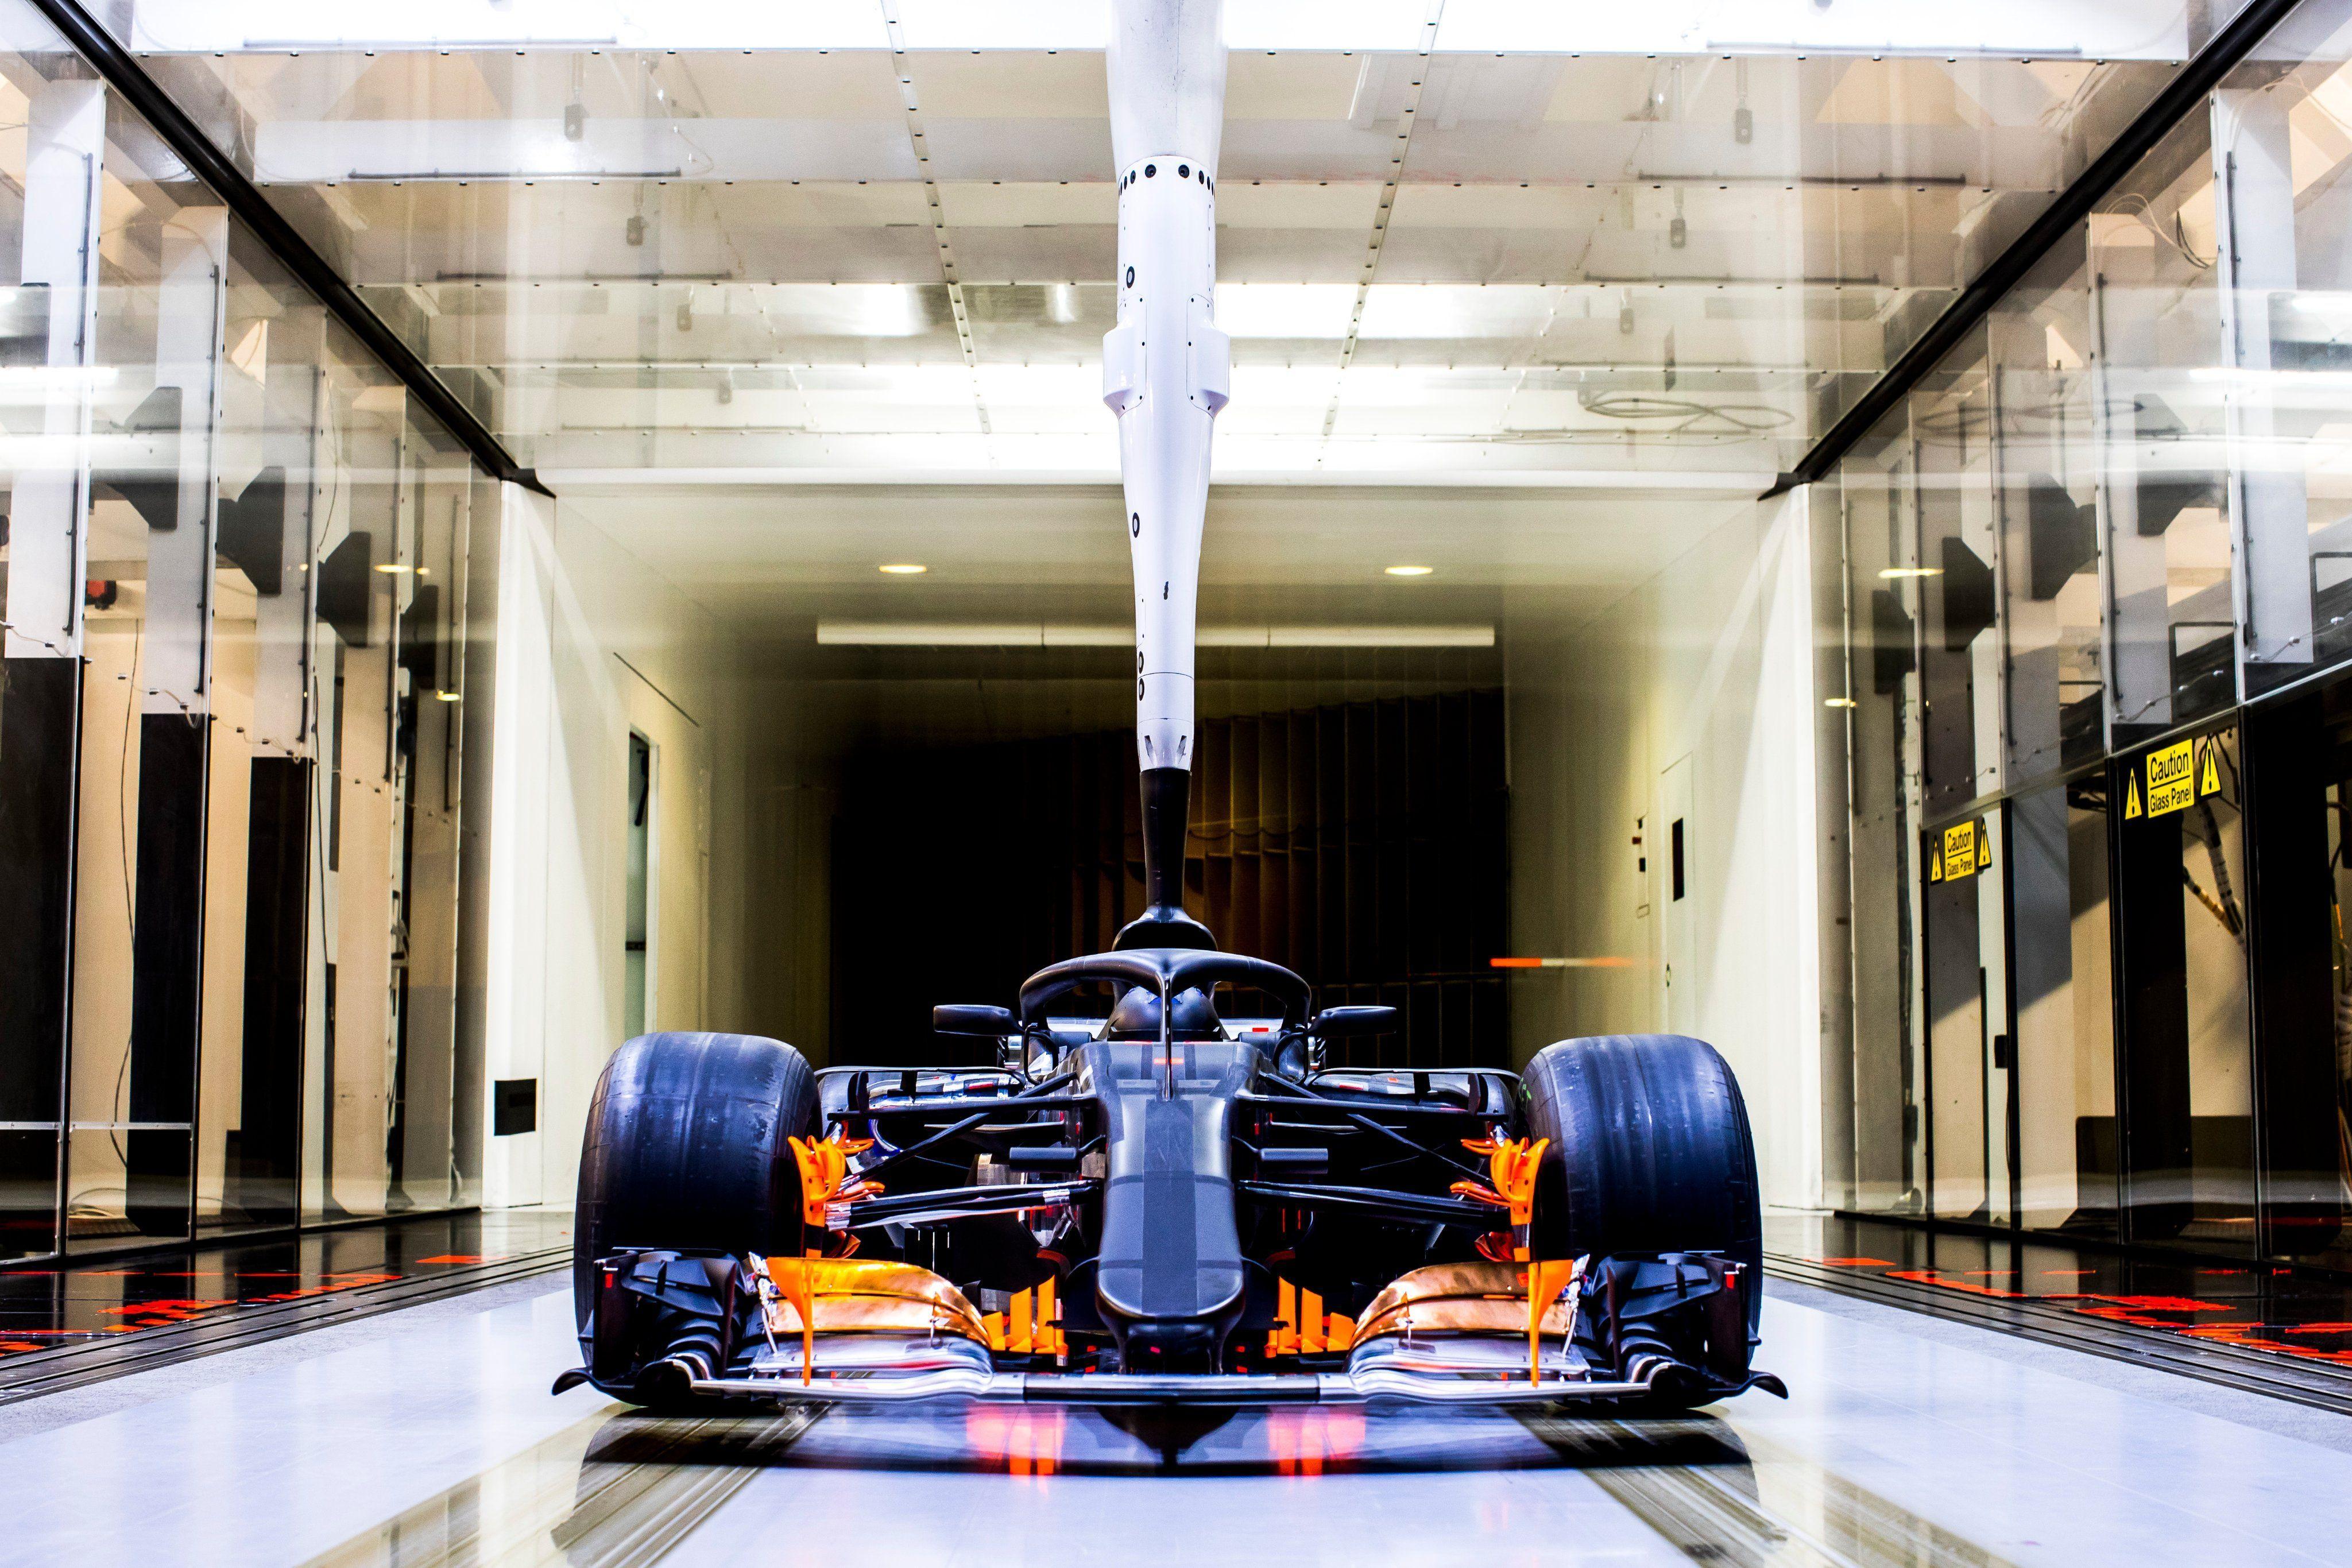 F1, UK Government, Project Pitlane